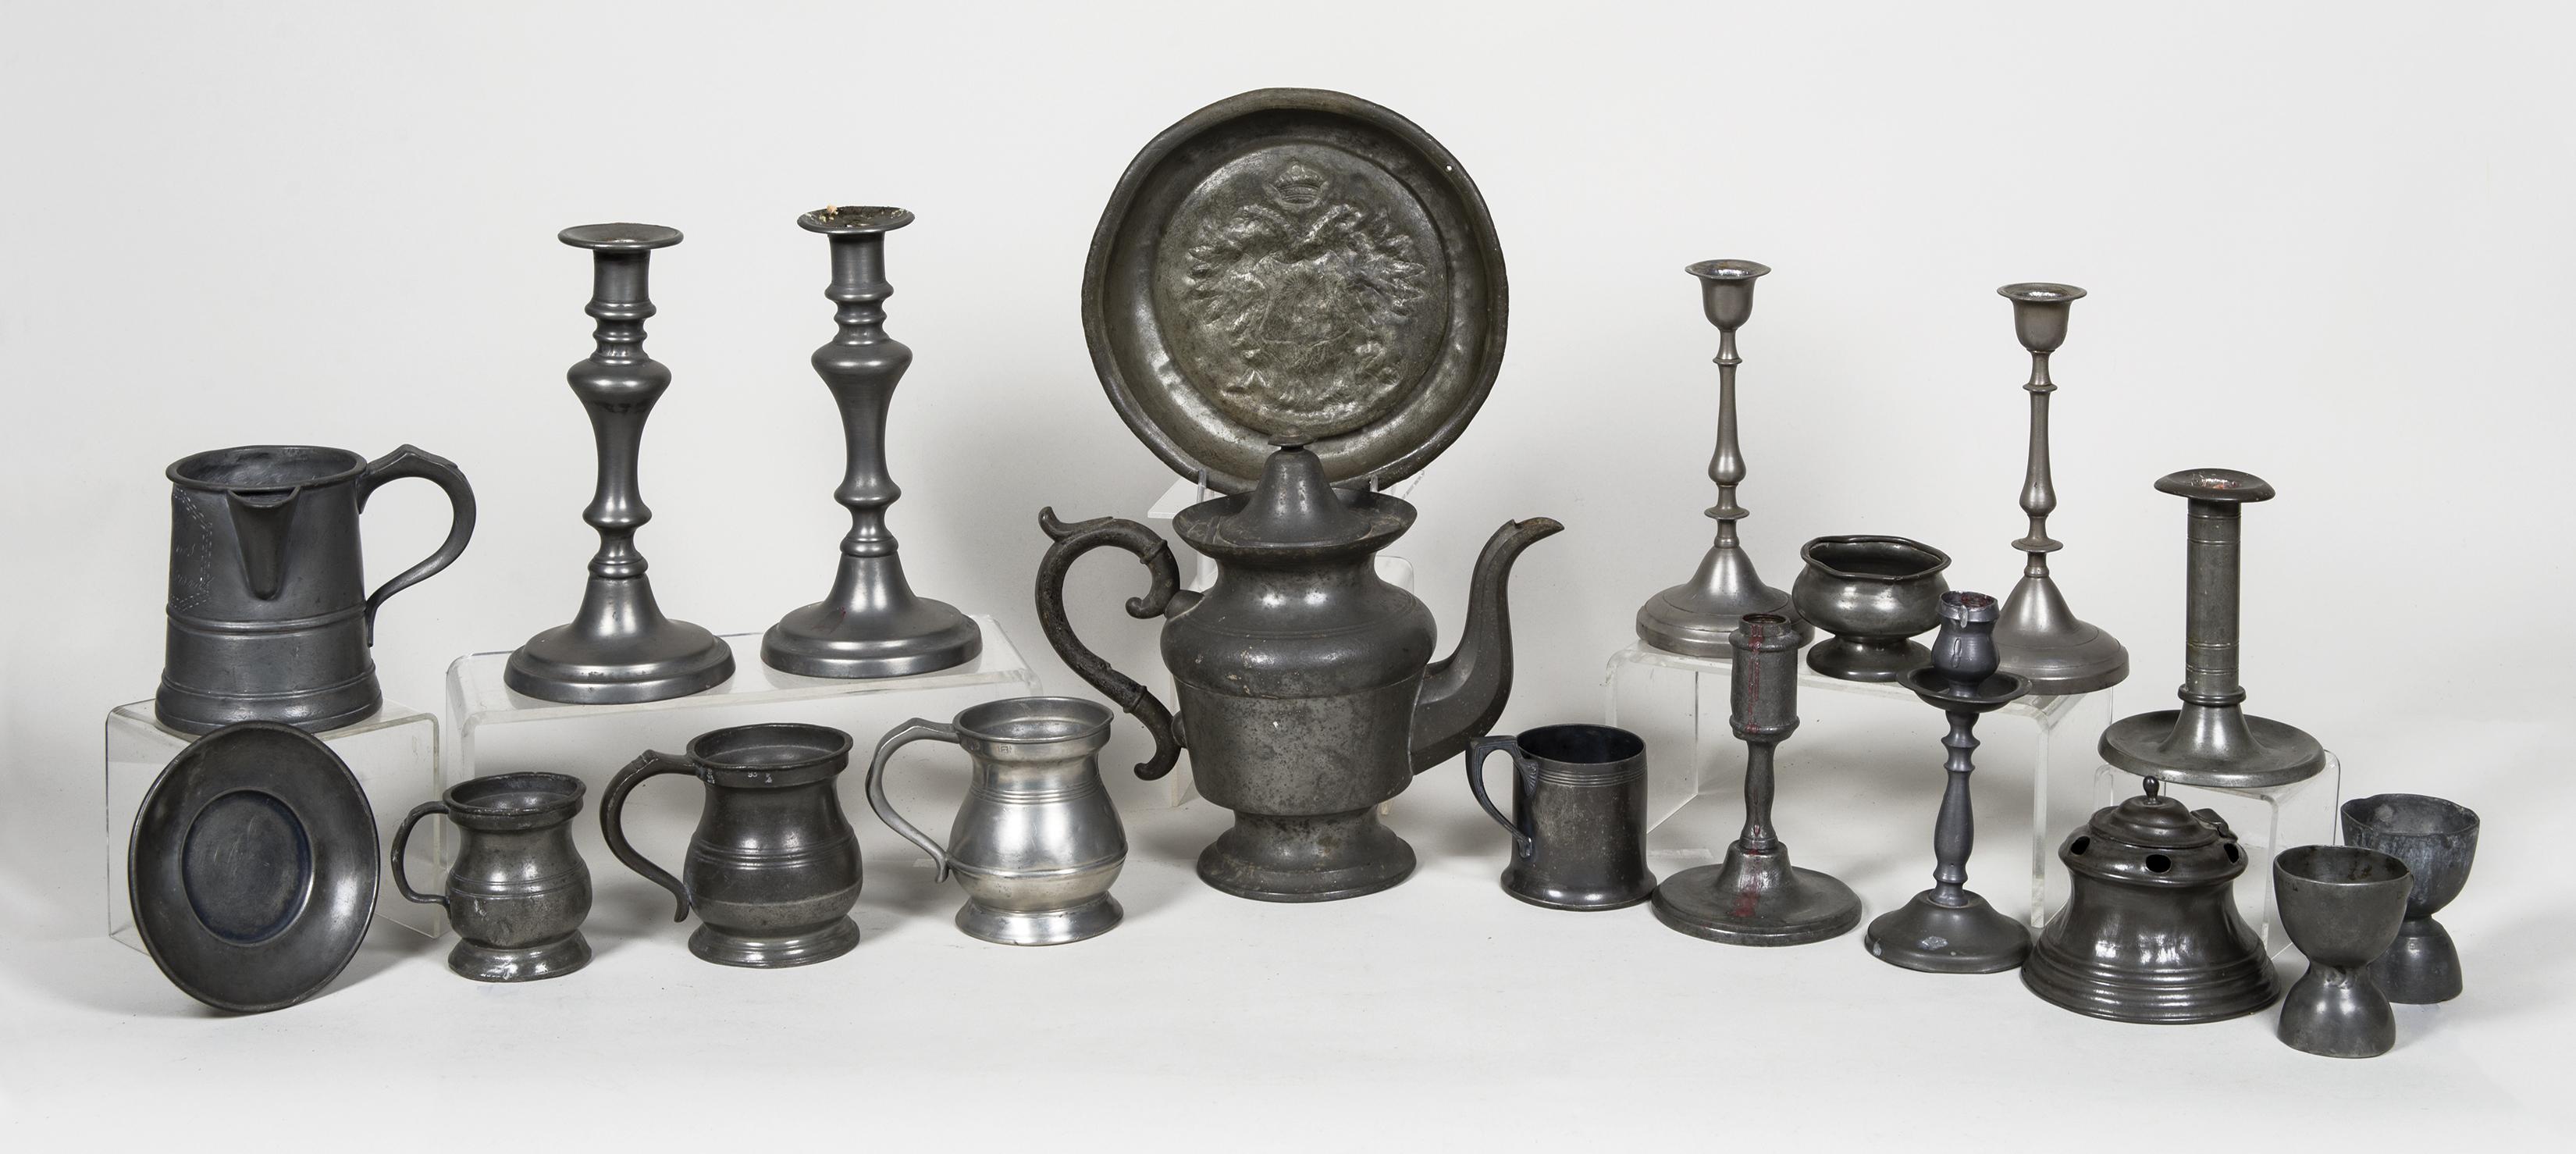 pewter, candlesticks, measures